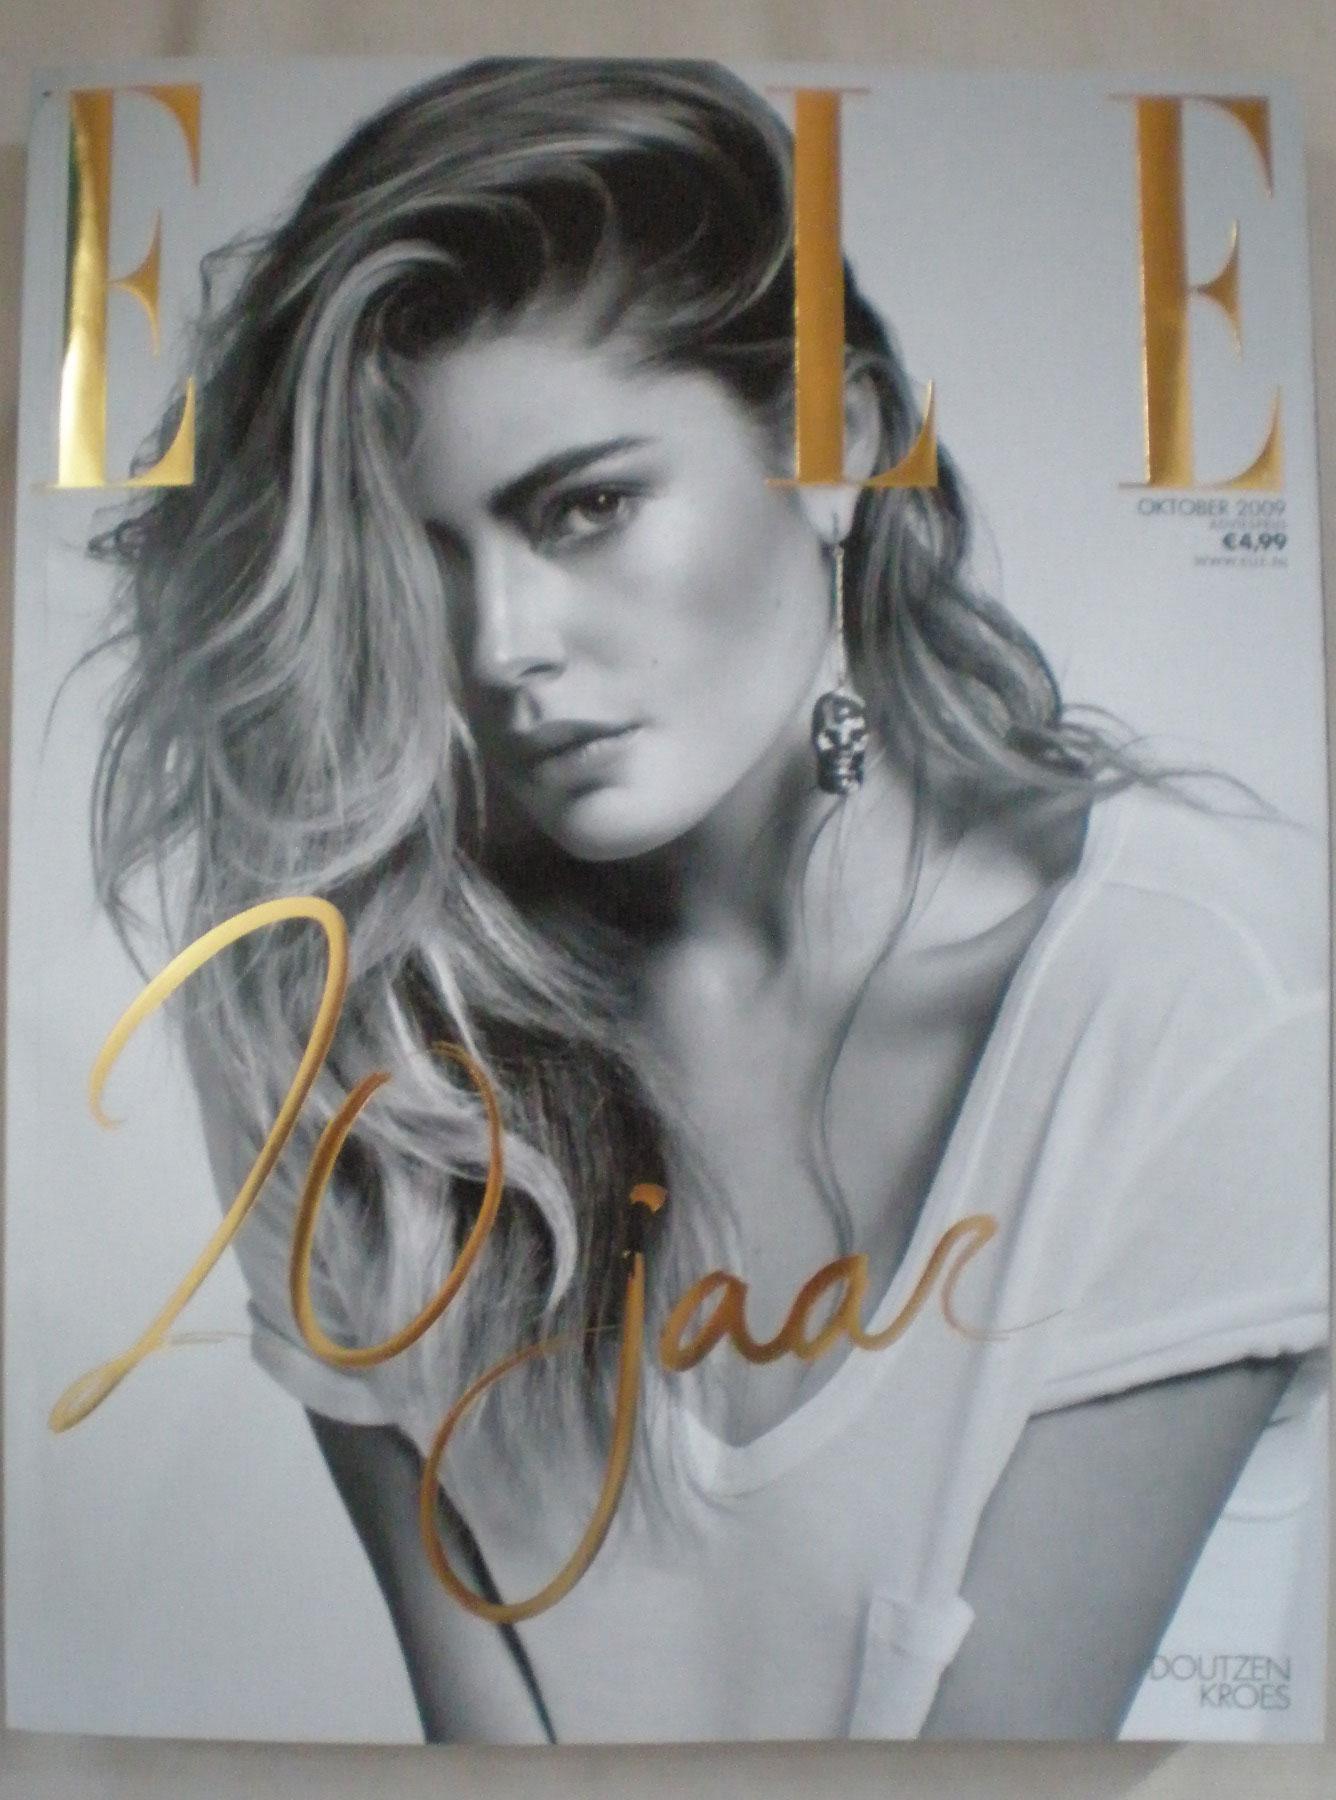 Dutch Elle celebrating 20 years anniversary!